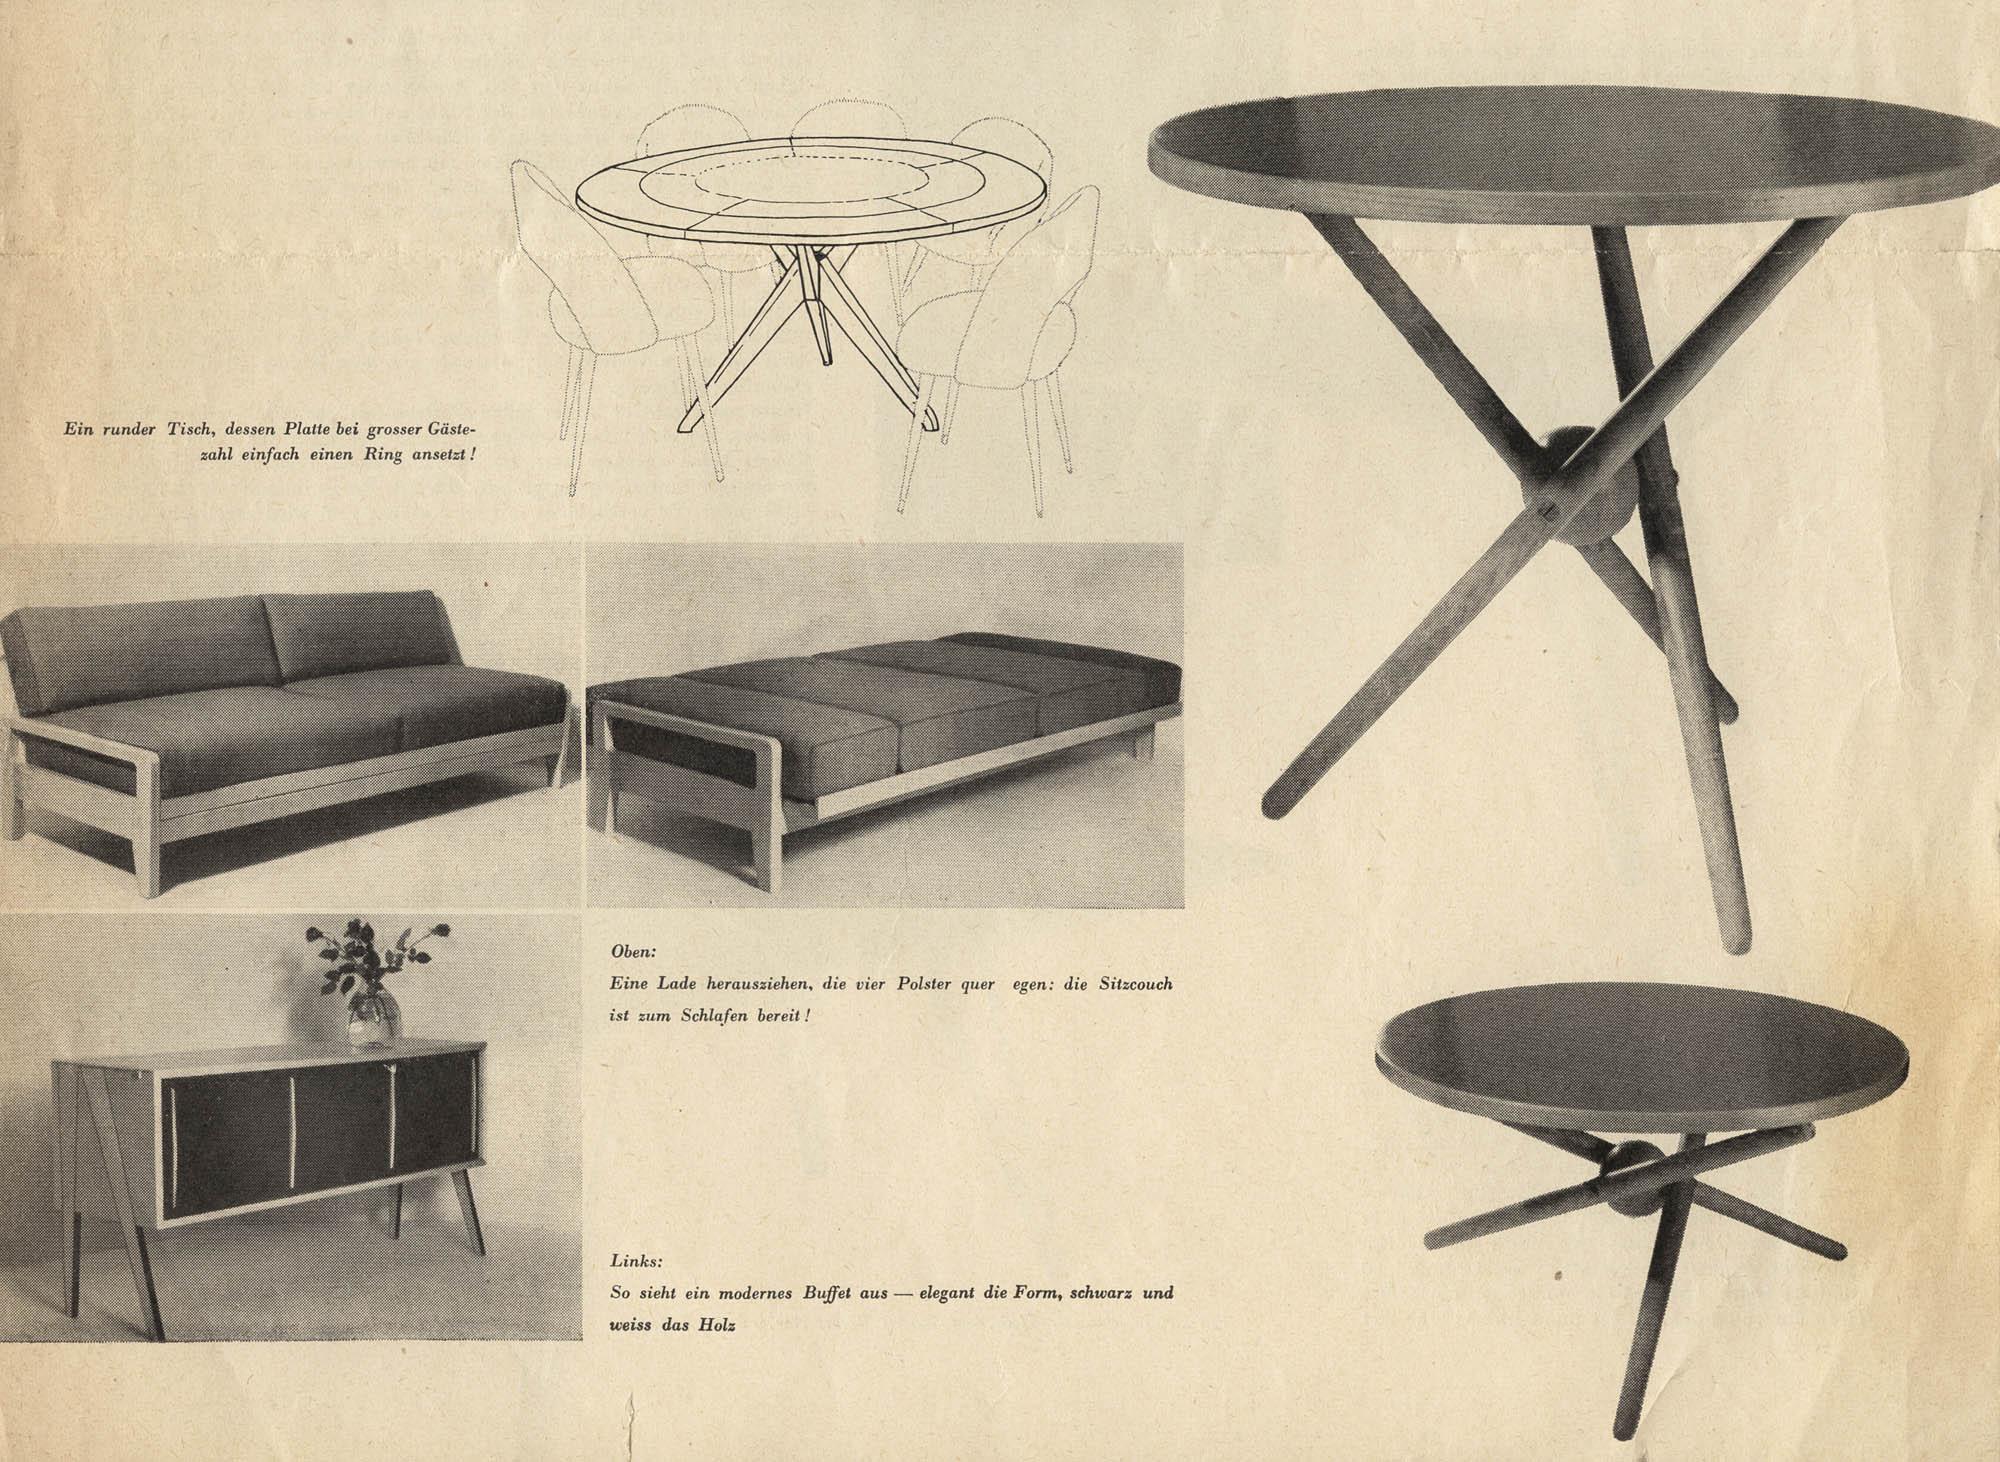 S.T.-Tisch Jürg Bally Table à hauteur réglable